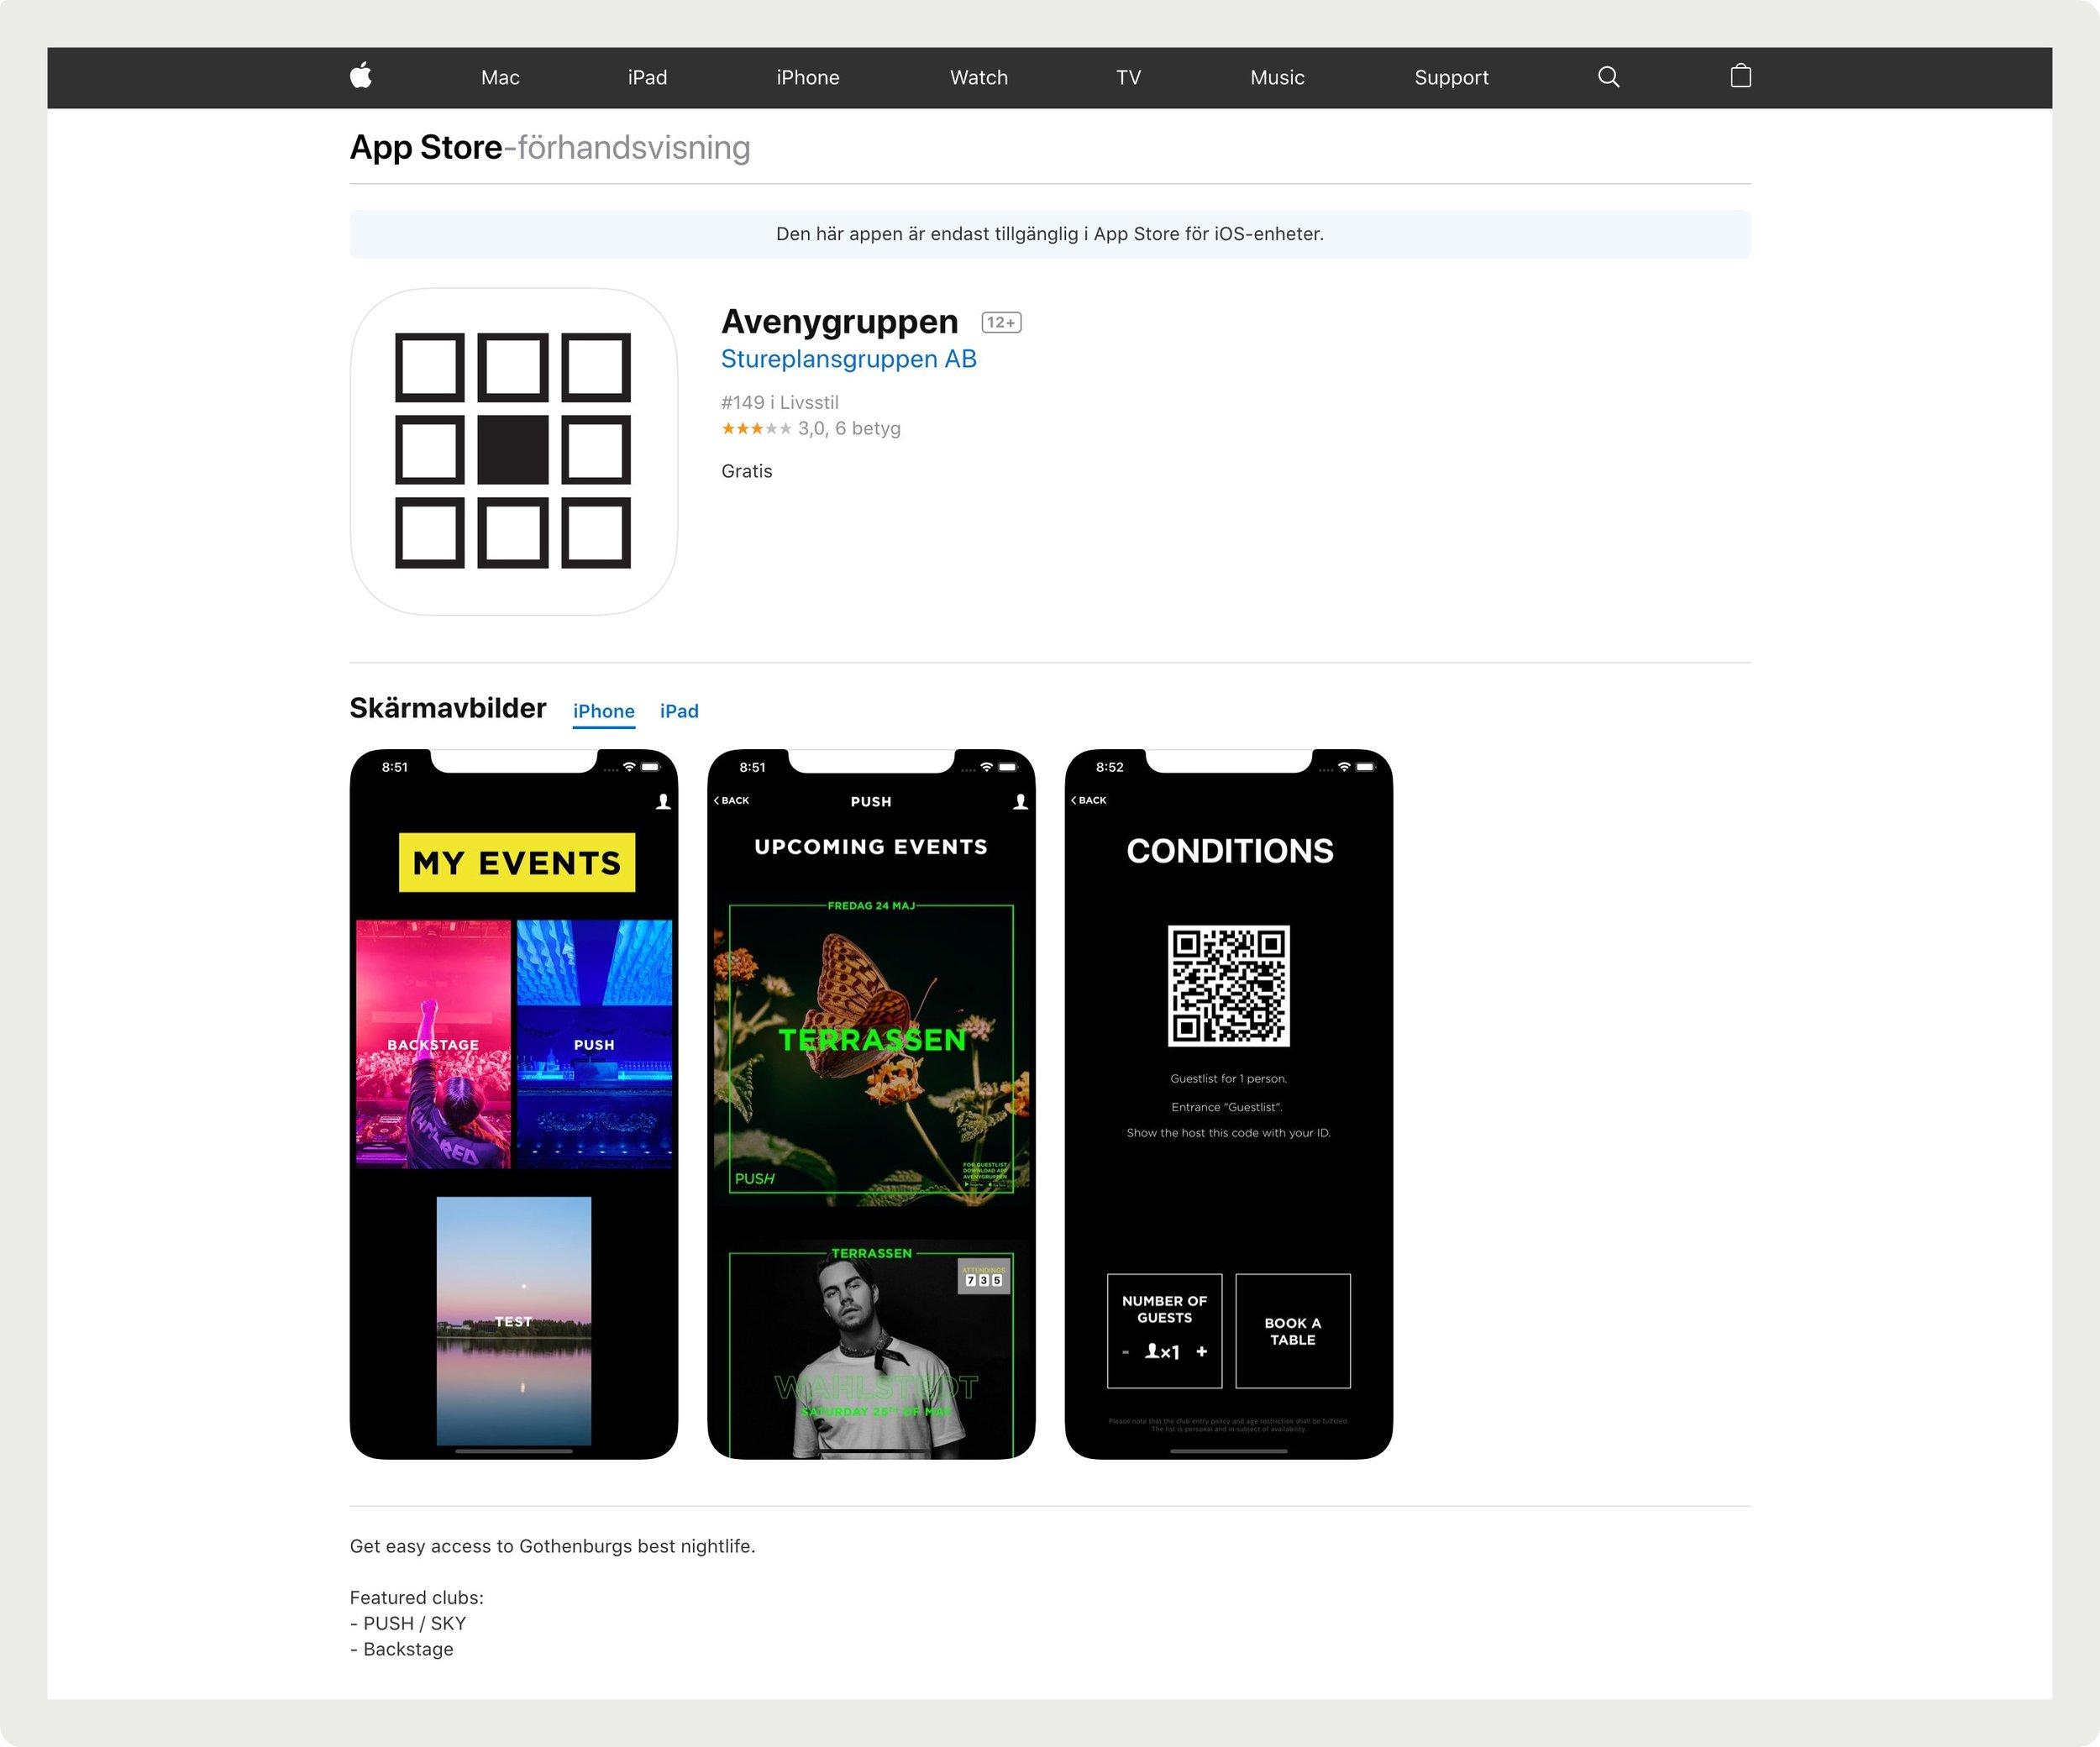 framtidens-webbyrå-uppdrag-push-hemsida-appstore